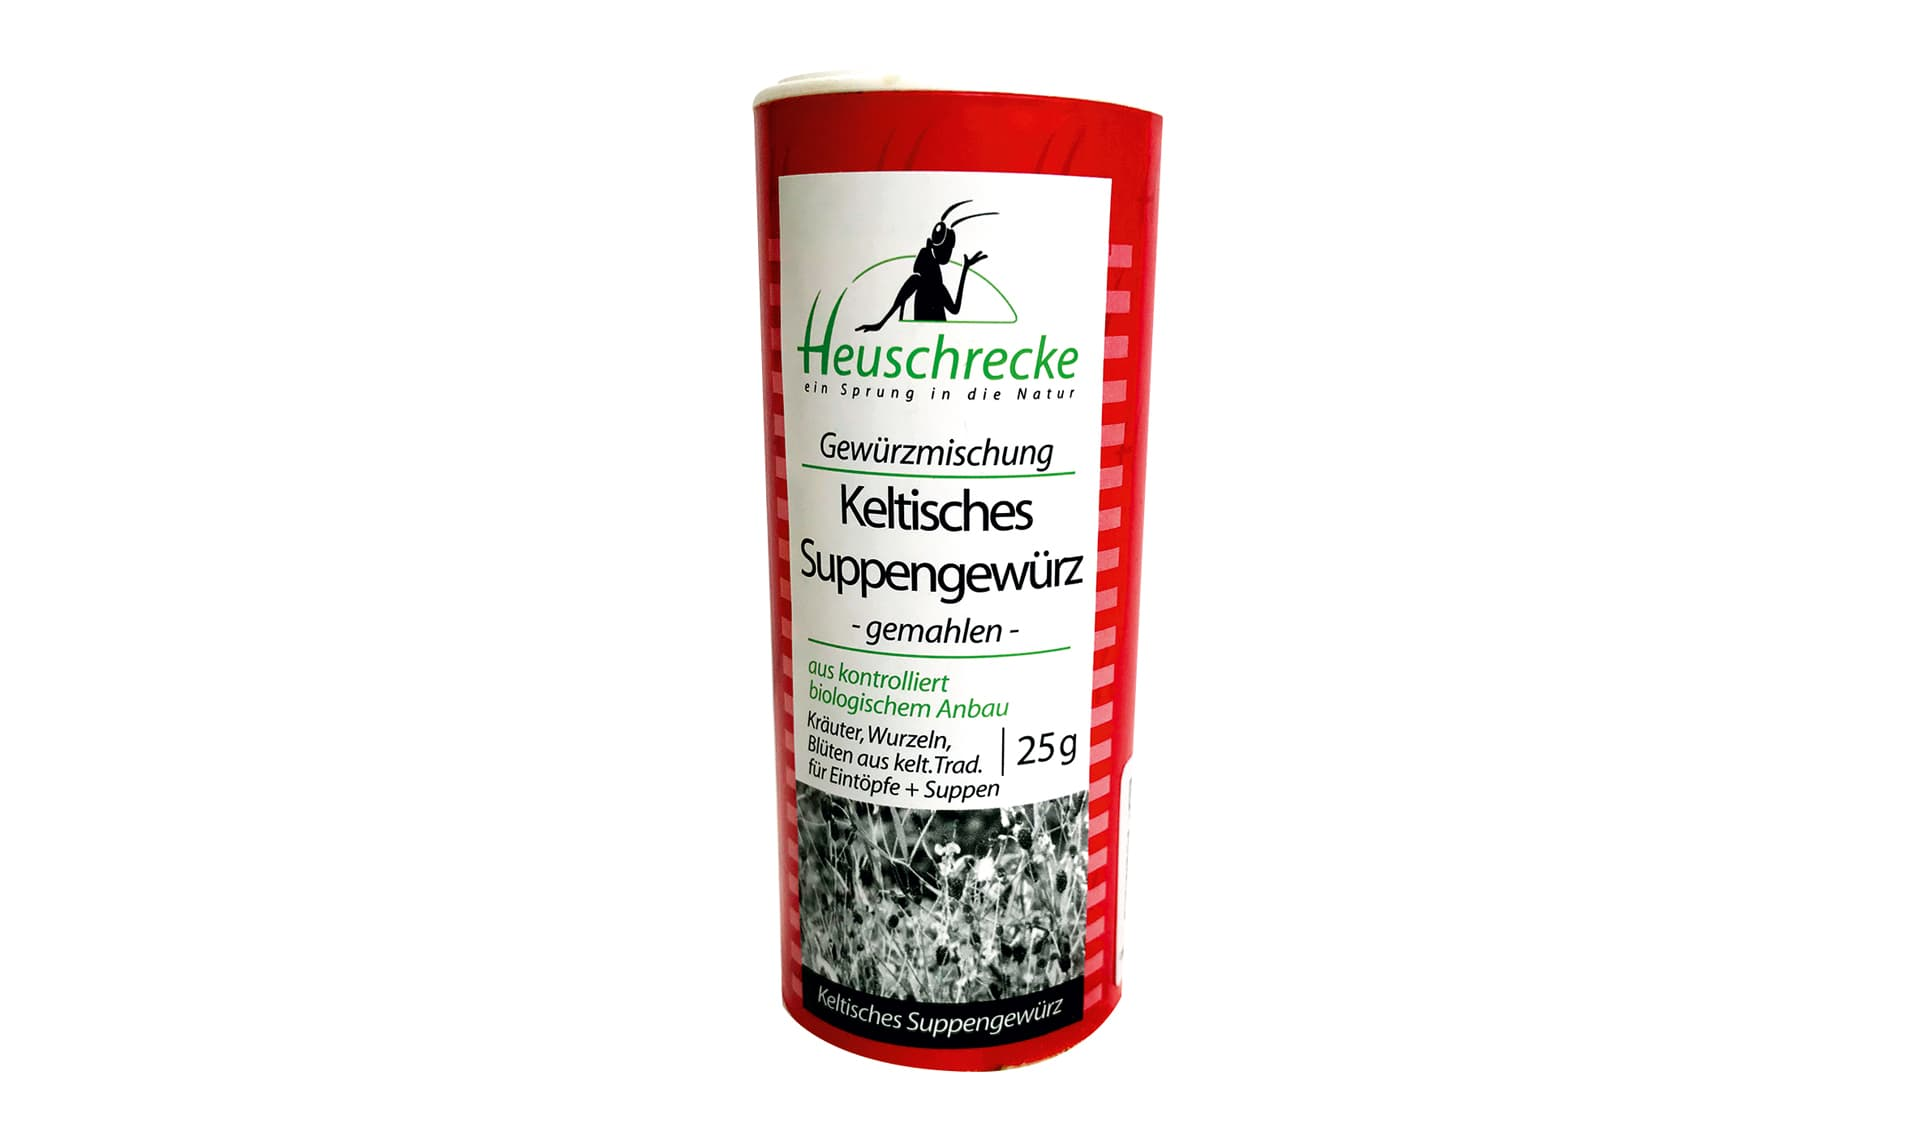 Heuschrecke Naturkost Keltisches Suppengewürz (www.heuschrecke.com)